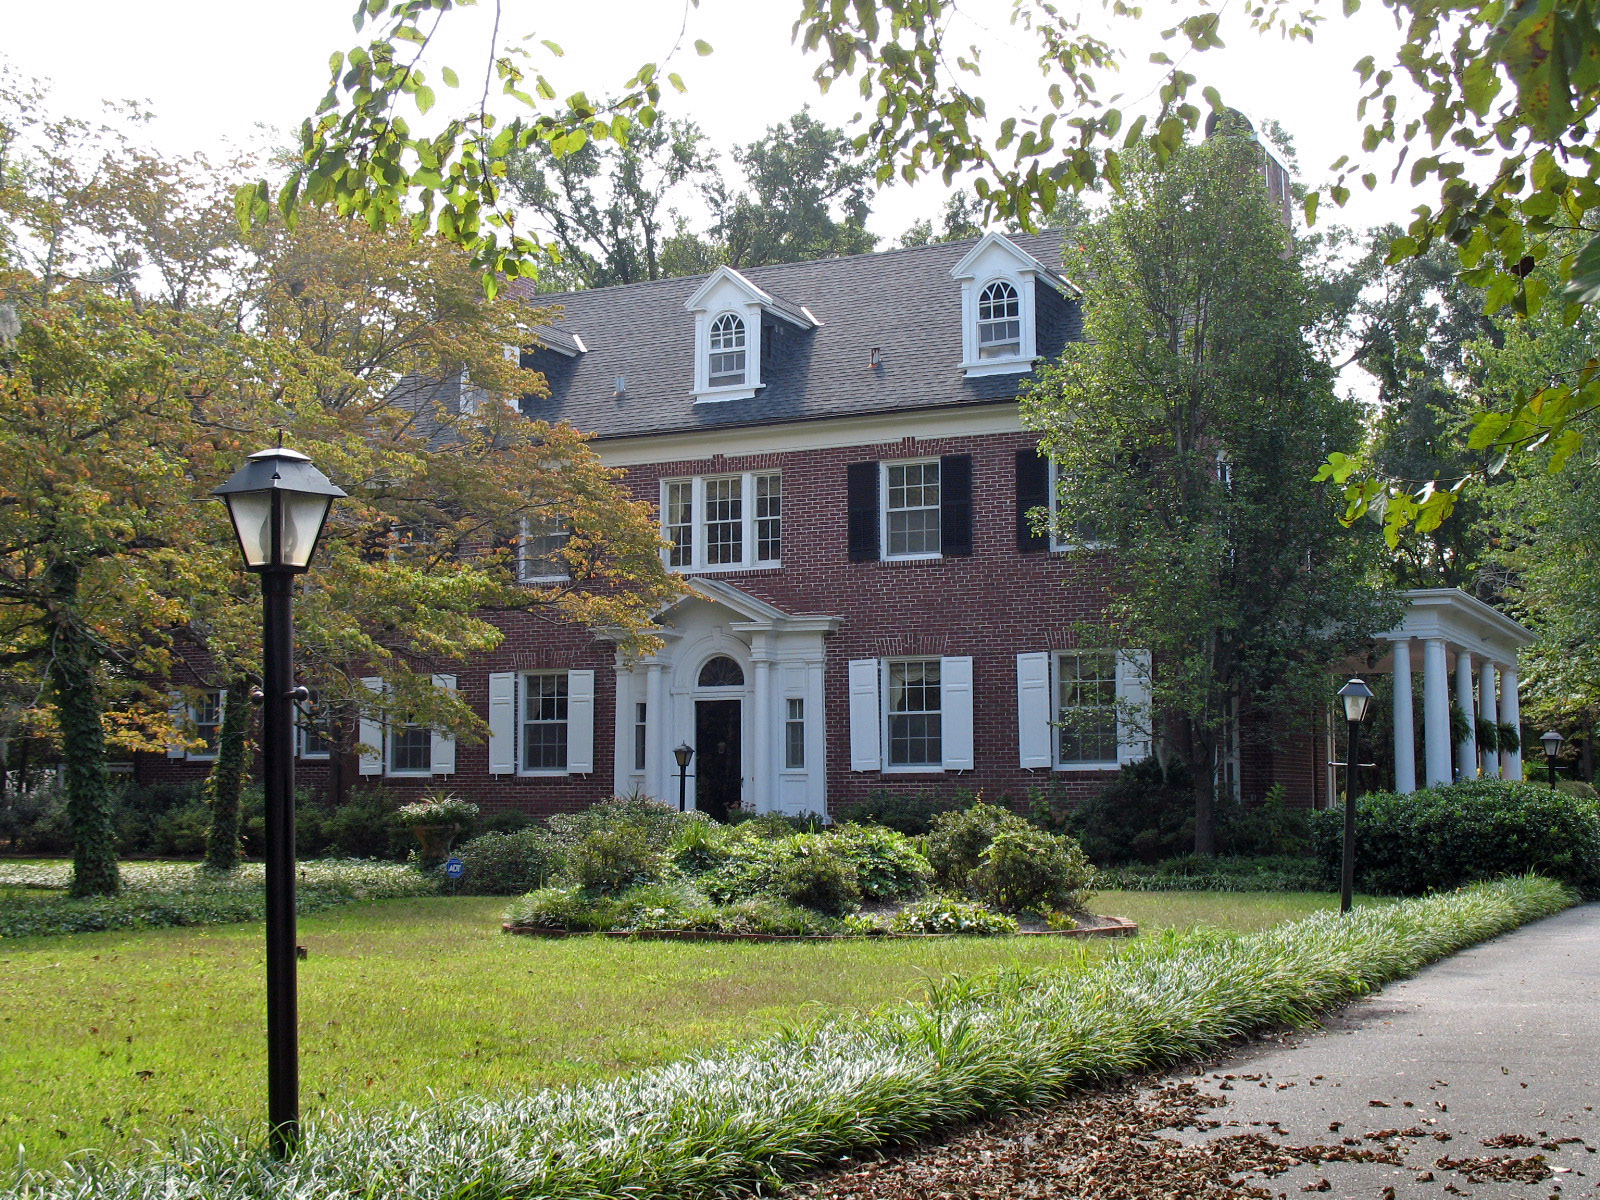 North Carolina Property Tax Orange County